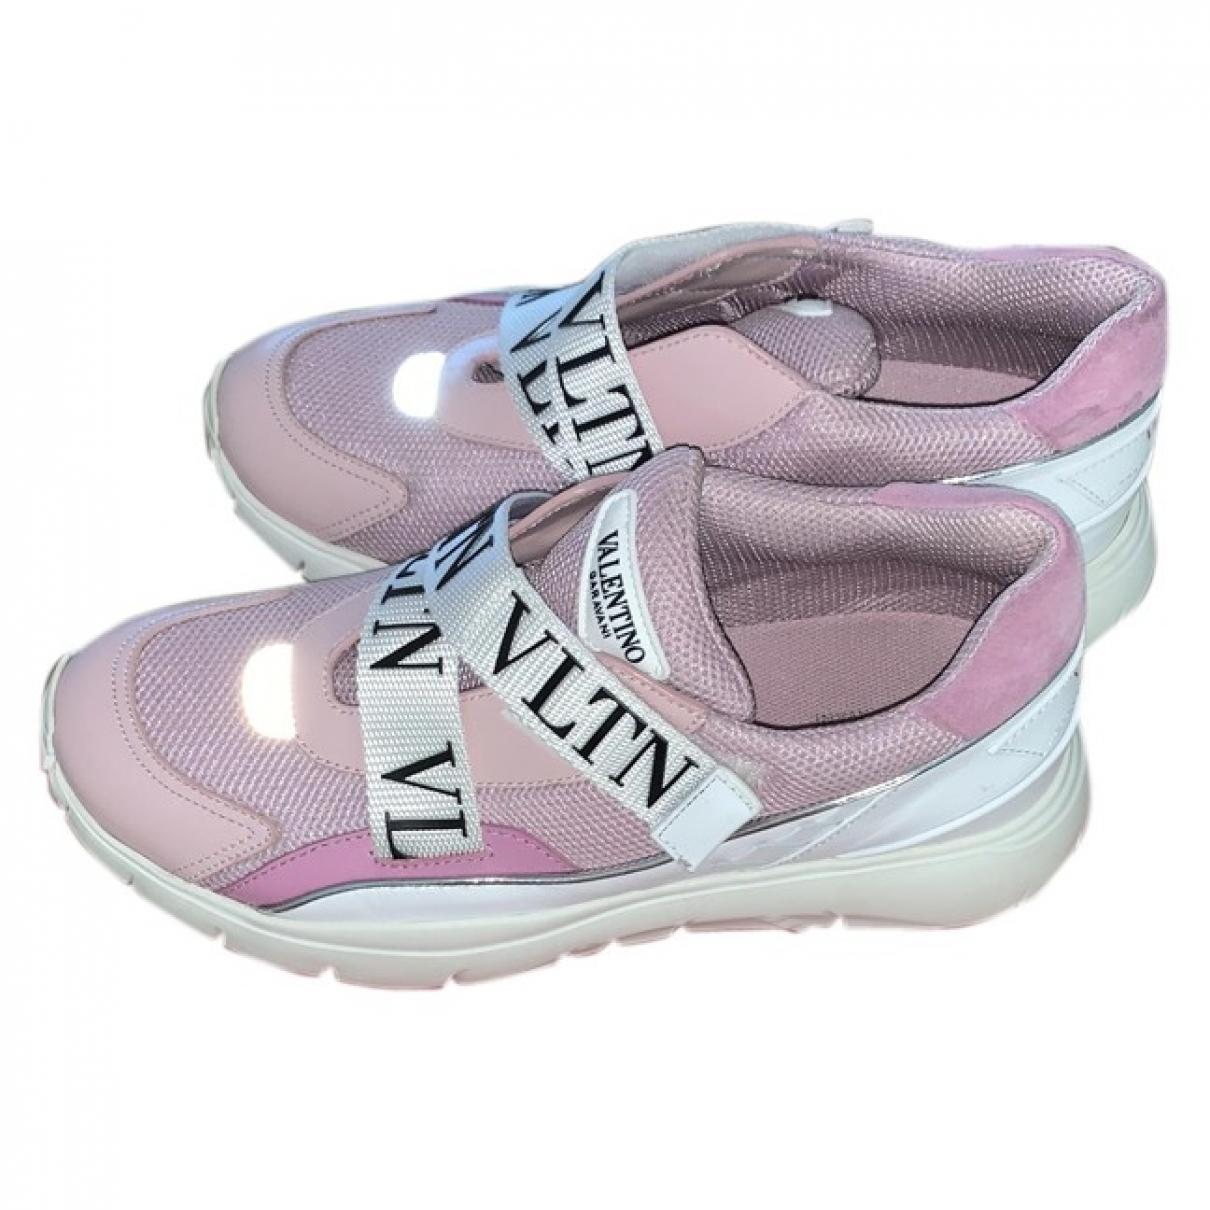 Valentino Garavani Heroes VLTN Pink Cloth Trainers for Women 37.5 EU